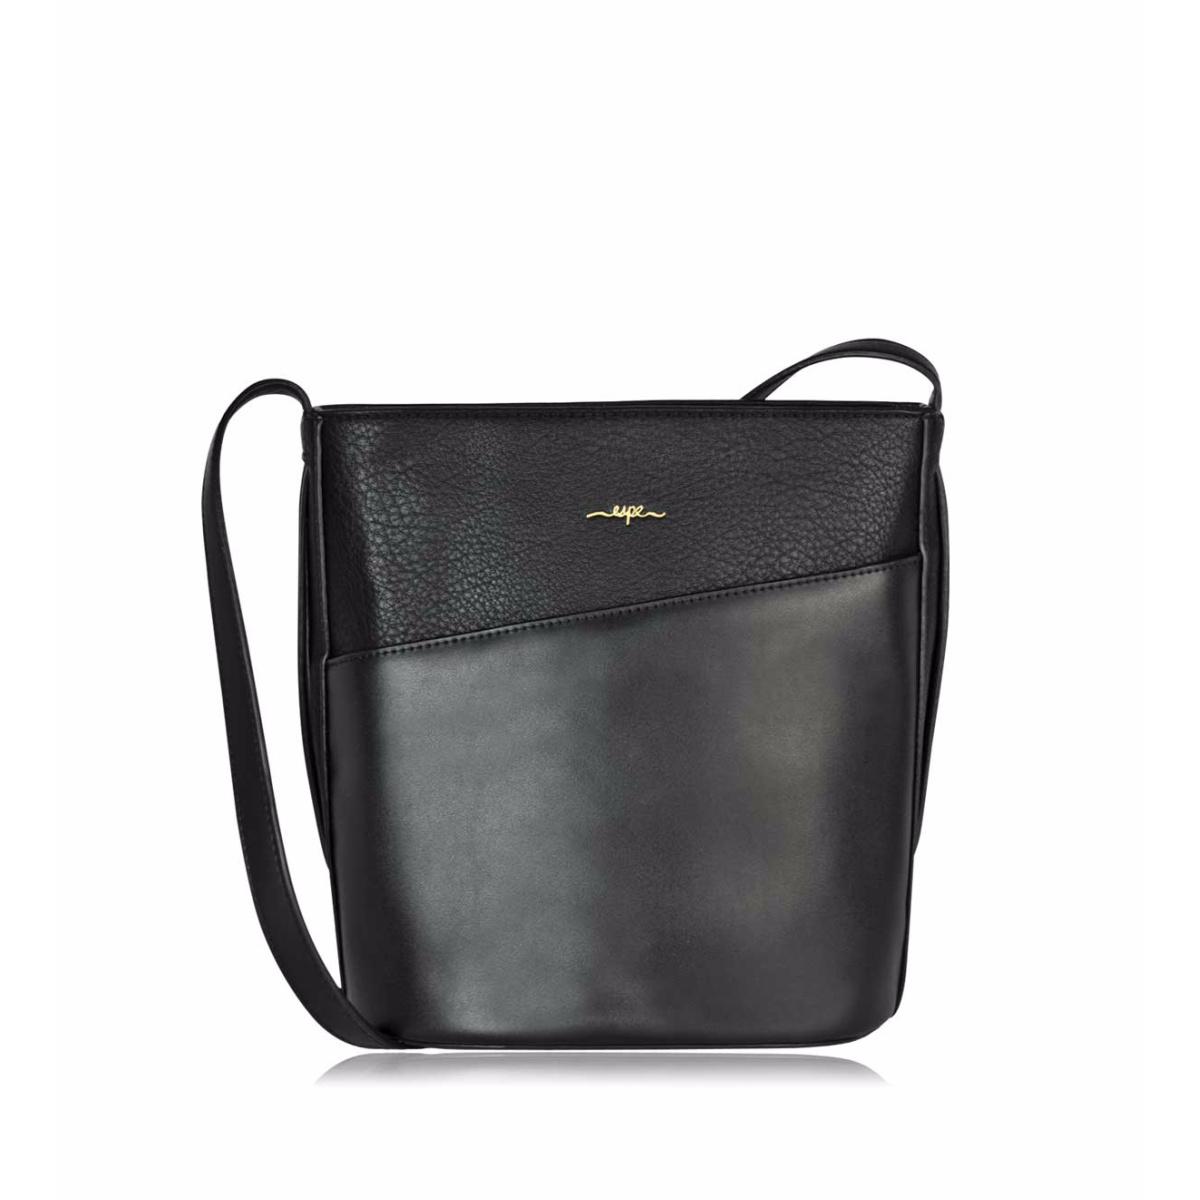 Espe Espe Emma Crossbody Bucket Bag